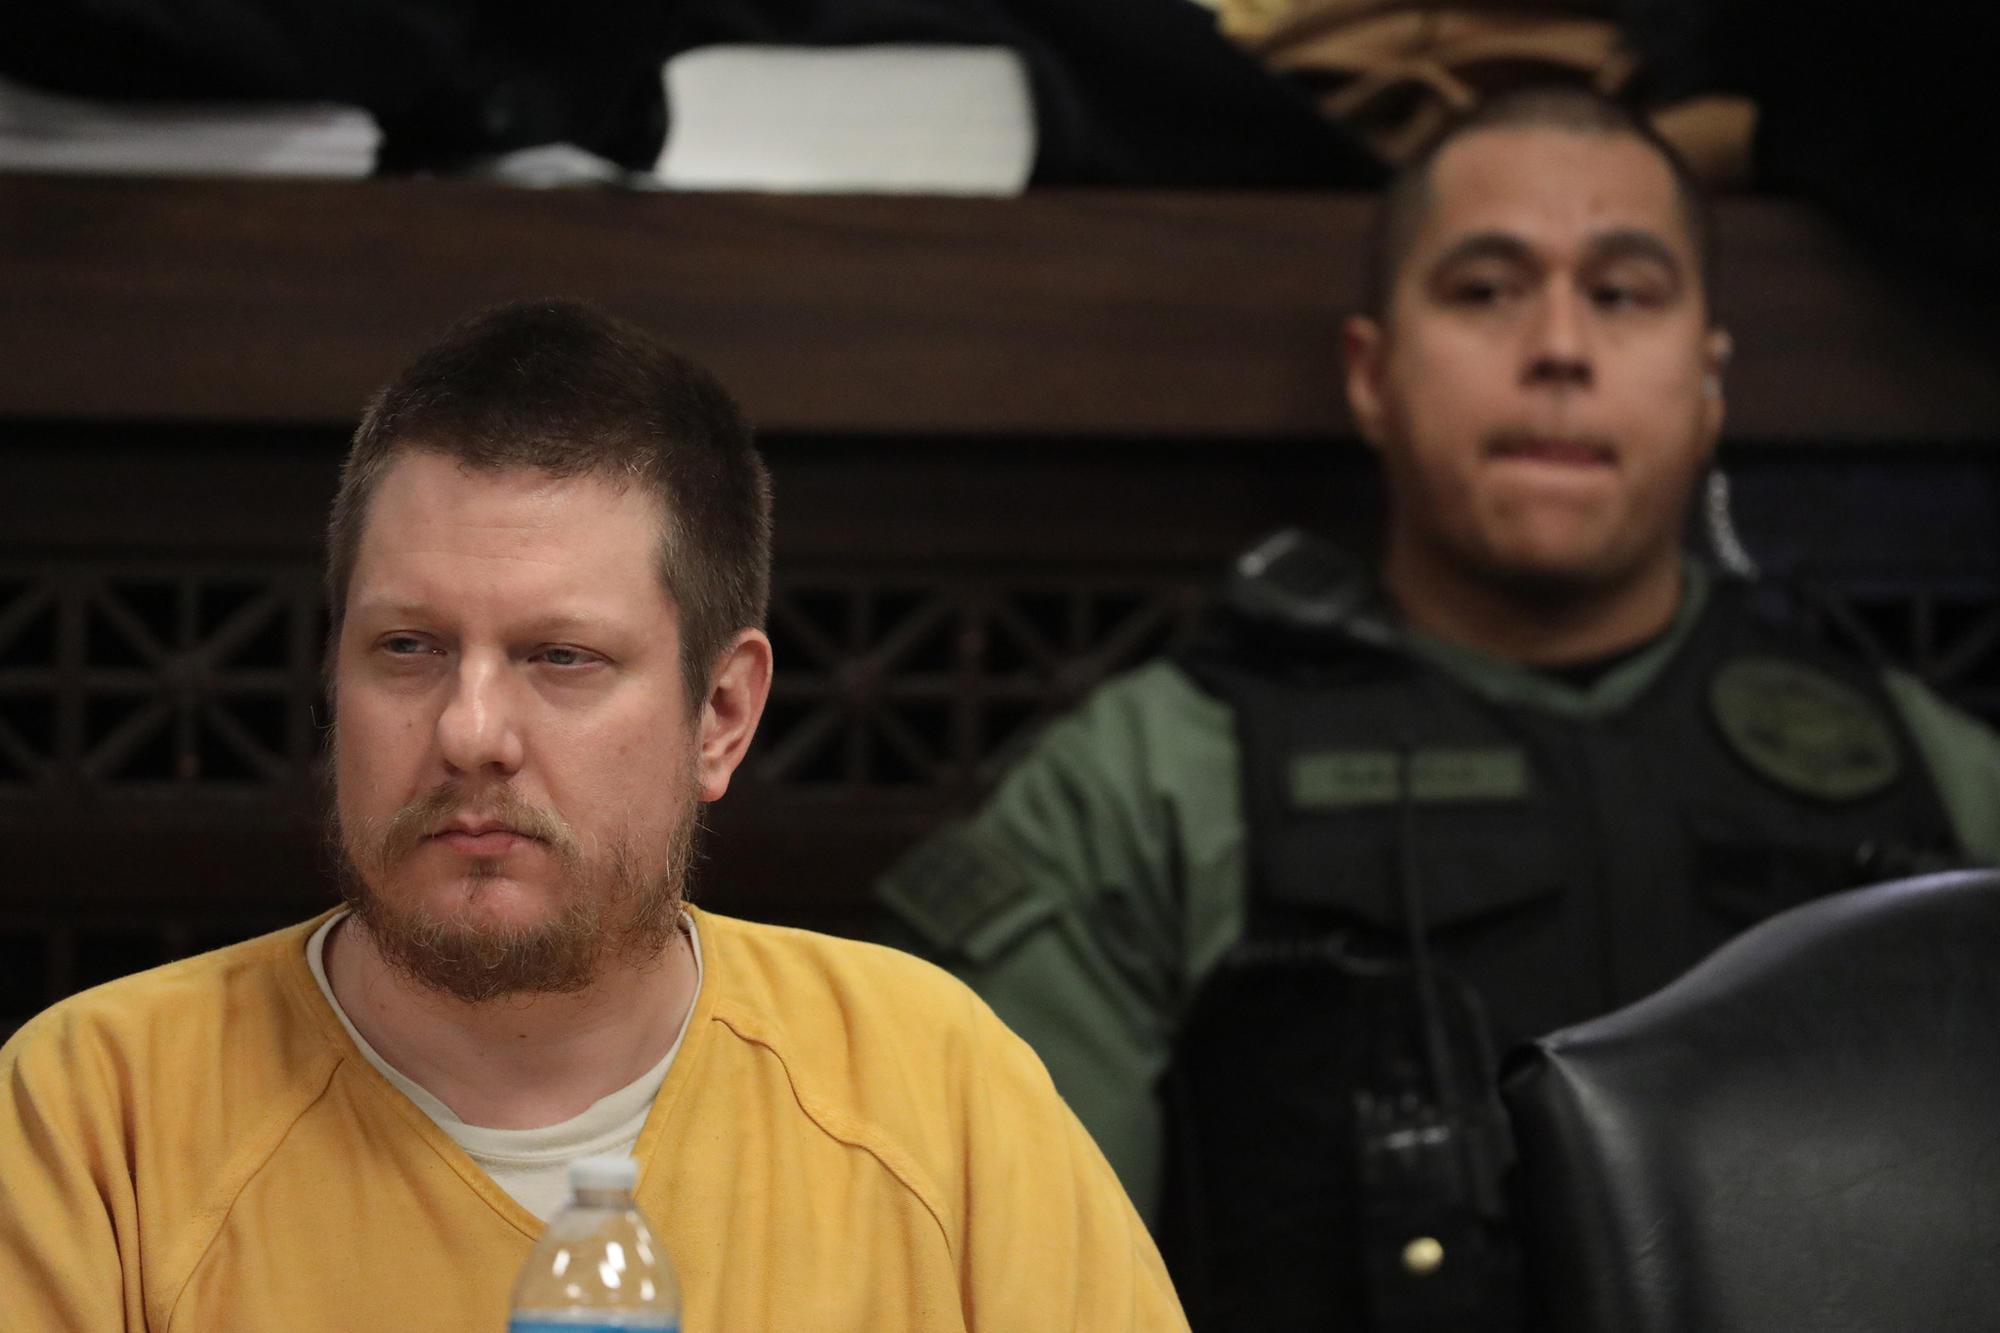 Jason Van Dyke sentenced to 6 3/4 years in prison for killing of Laquan McDonald   San Diego Union Tribune